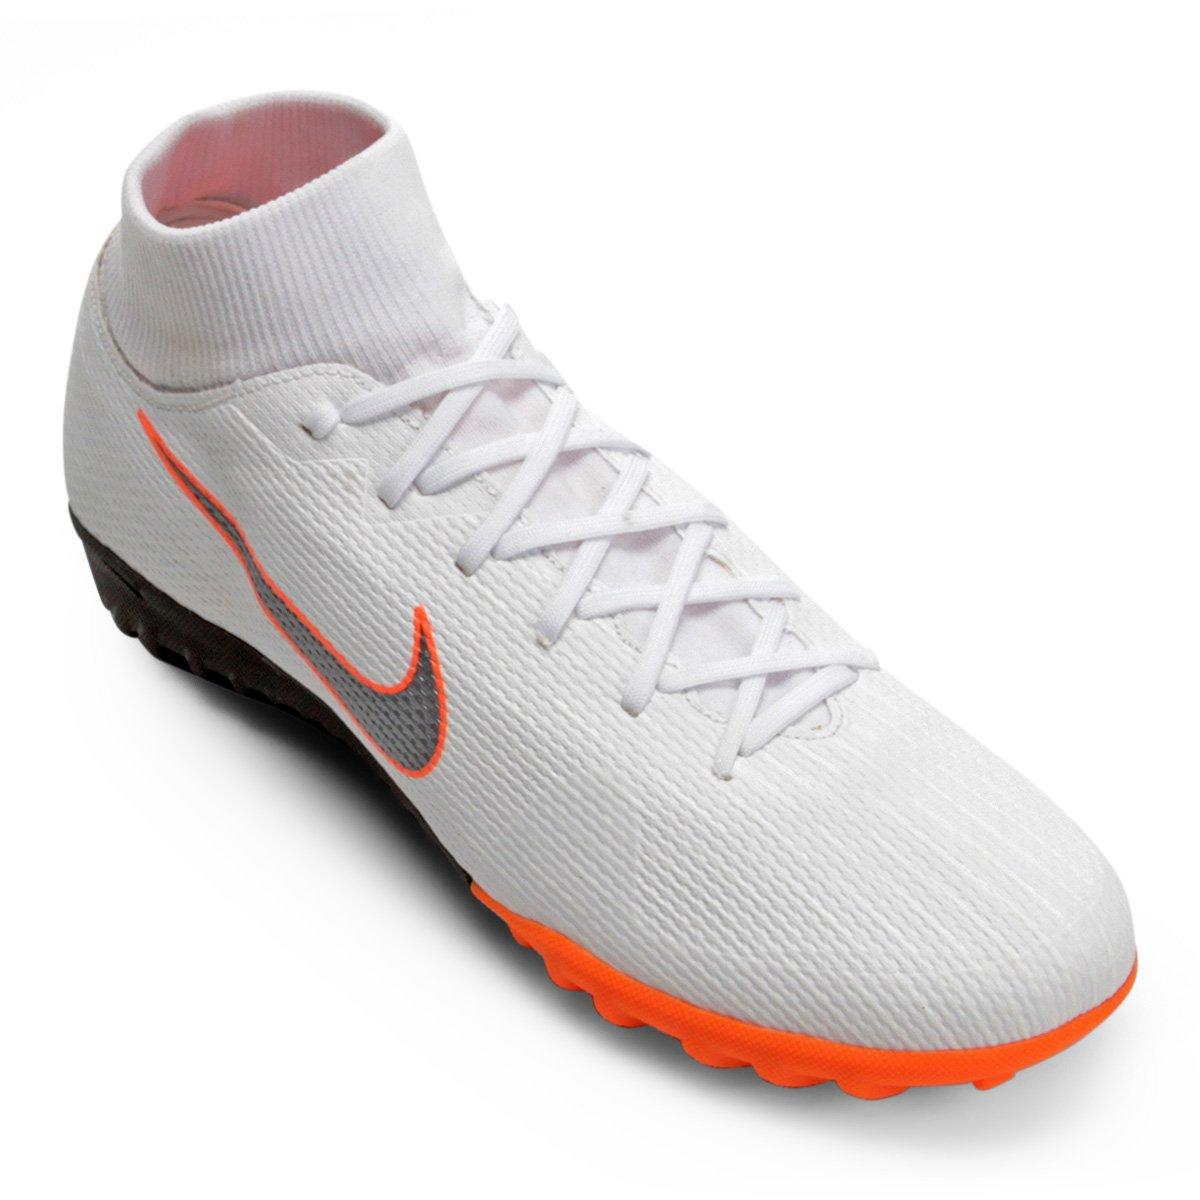 6222faa93e Chuteira Society Nike Mercurial Superfly 6 Academy - Branco e Cinza ...